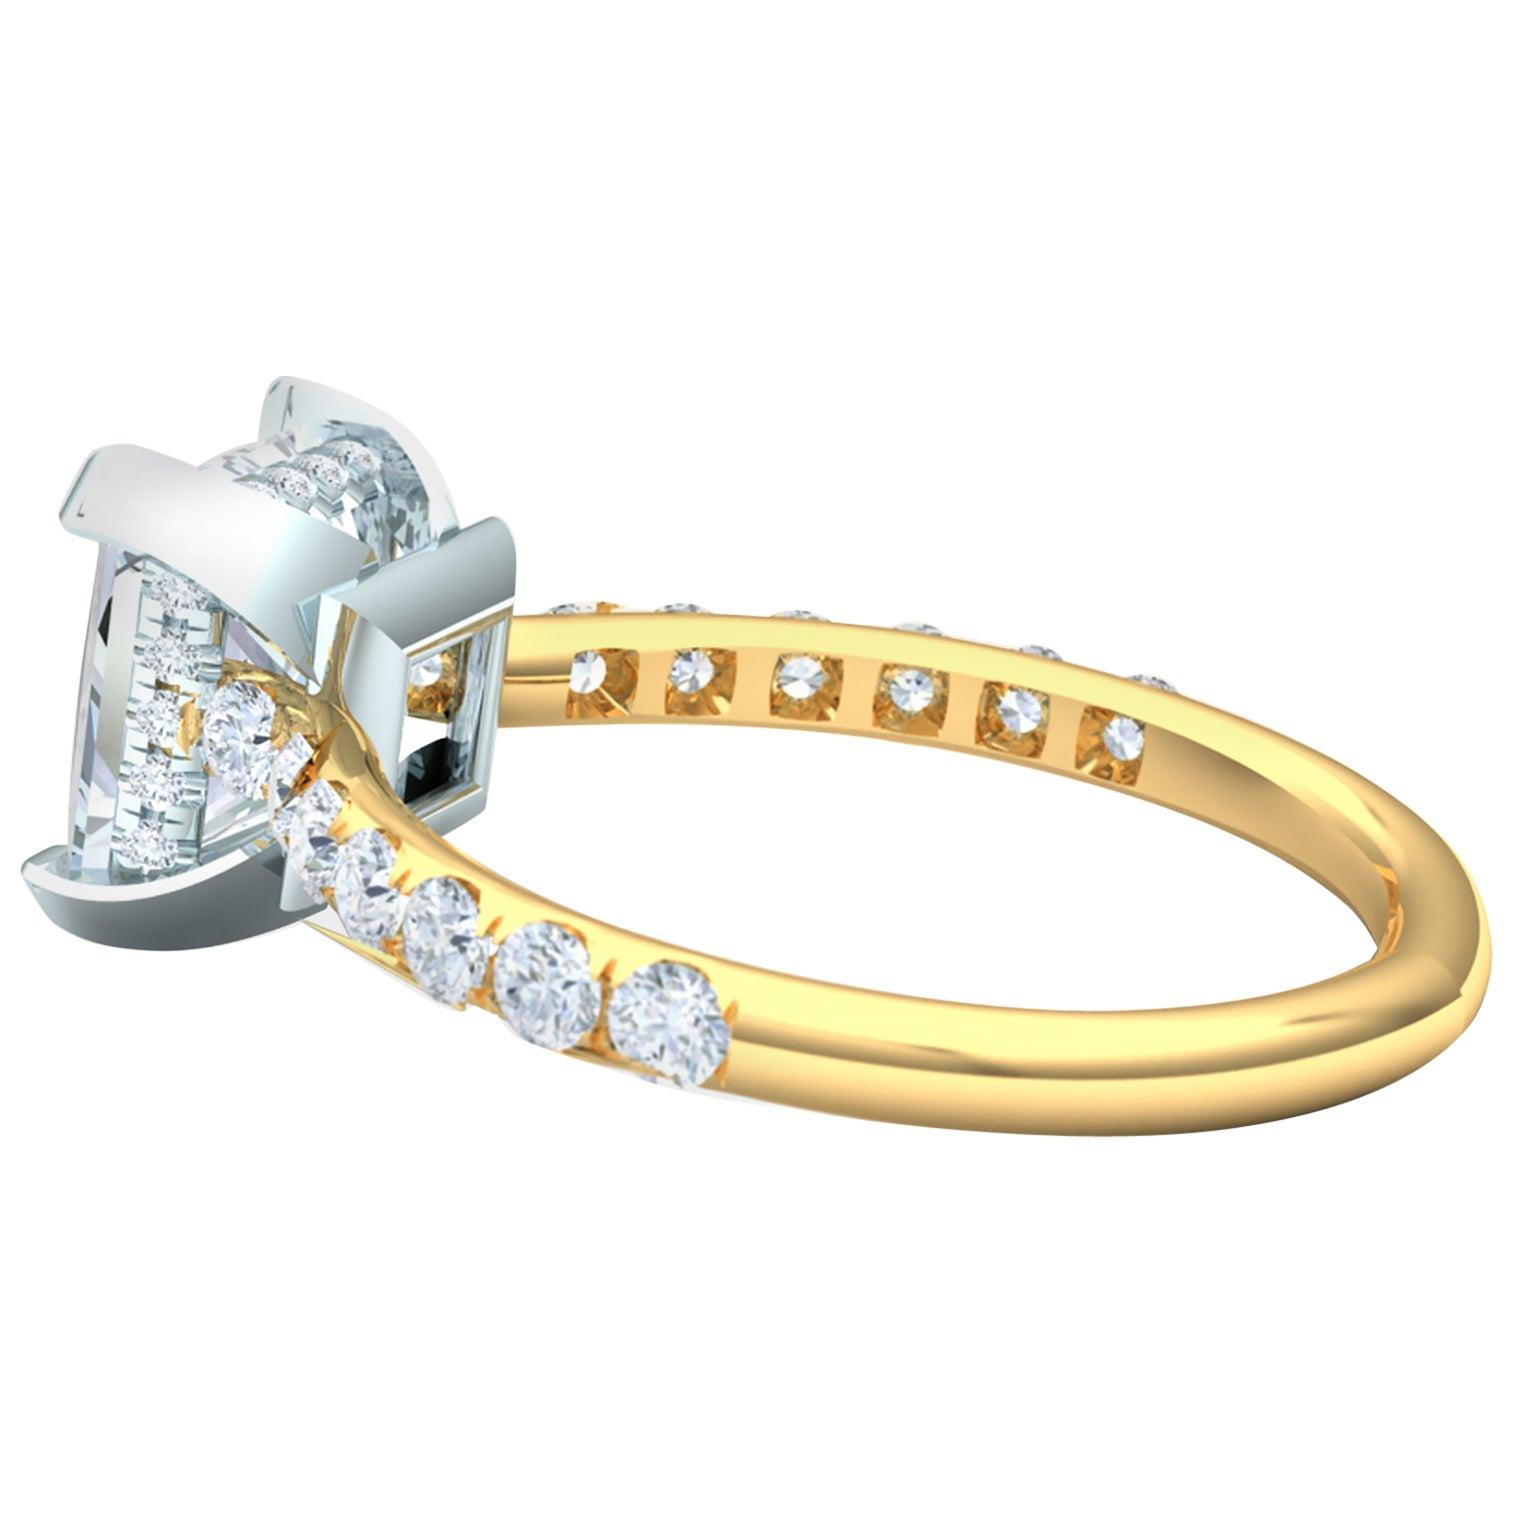 2 Carat GIA Certified D-SI1 Engagement Ring Platinum and 18 Karat Yellow Gold